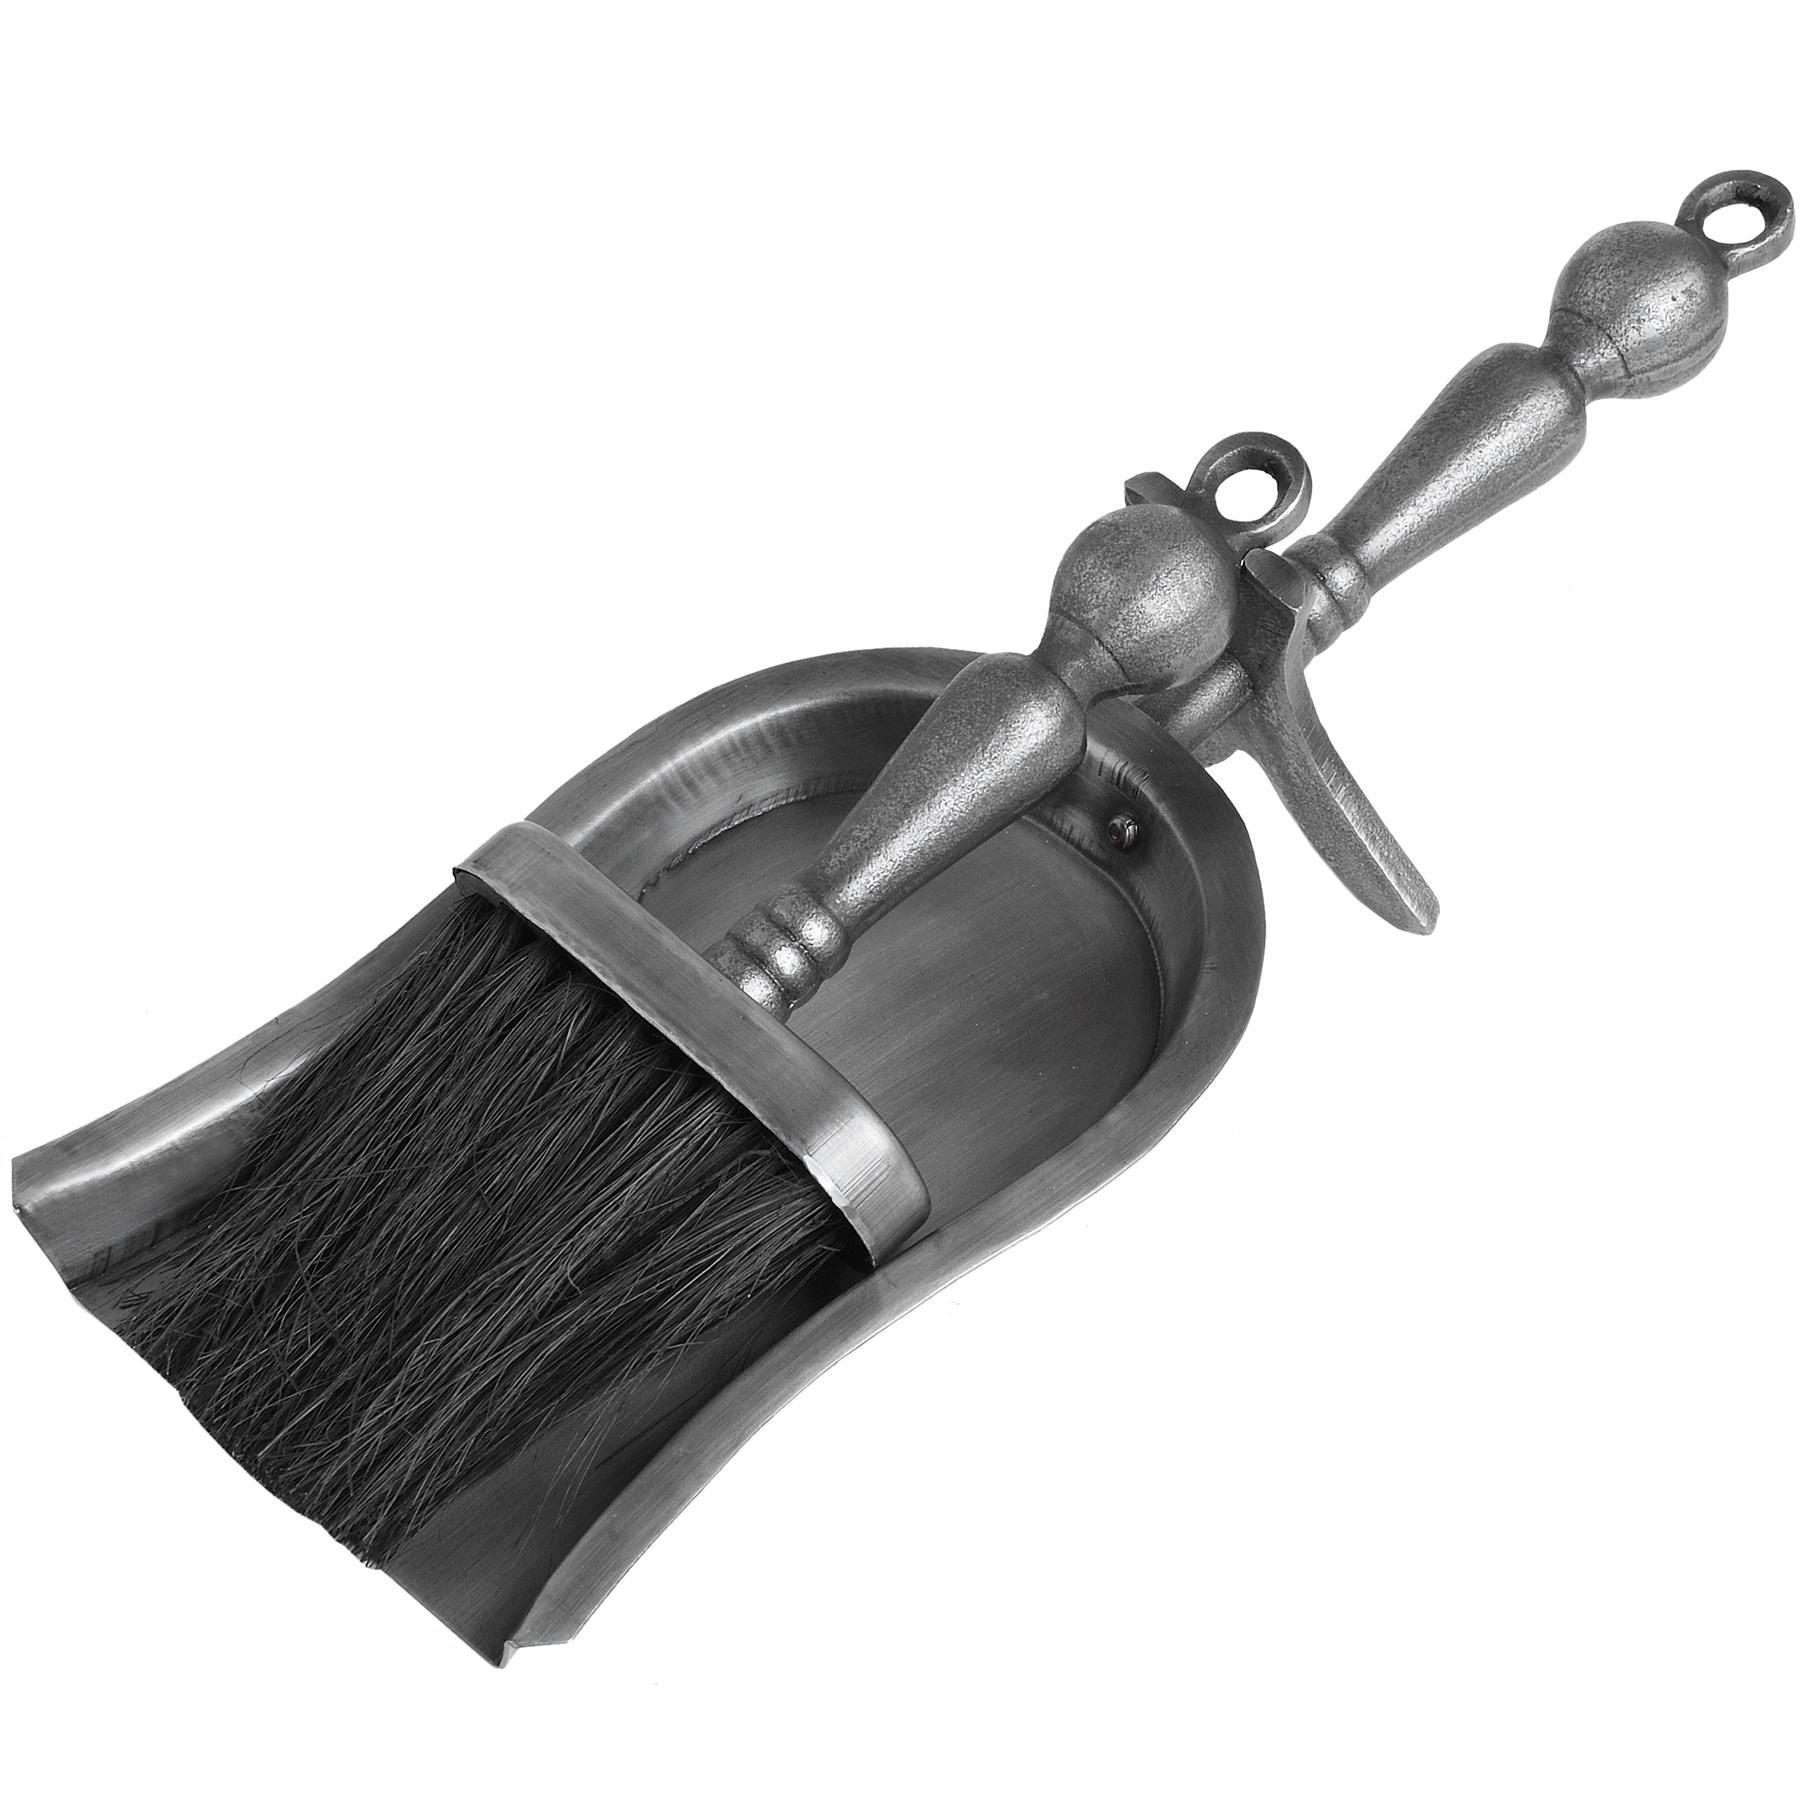 Silver Hearth Tidy Set Shovel Amp Brush Set Swanky Interiors